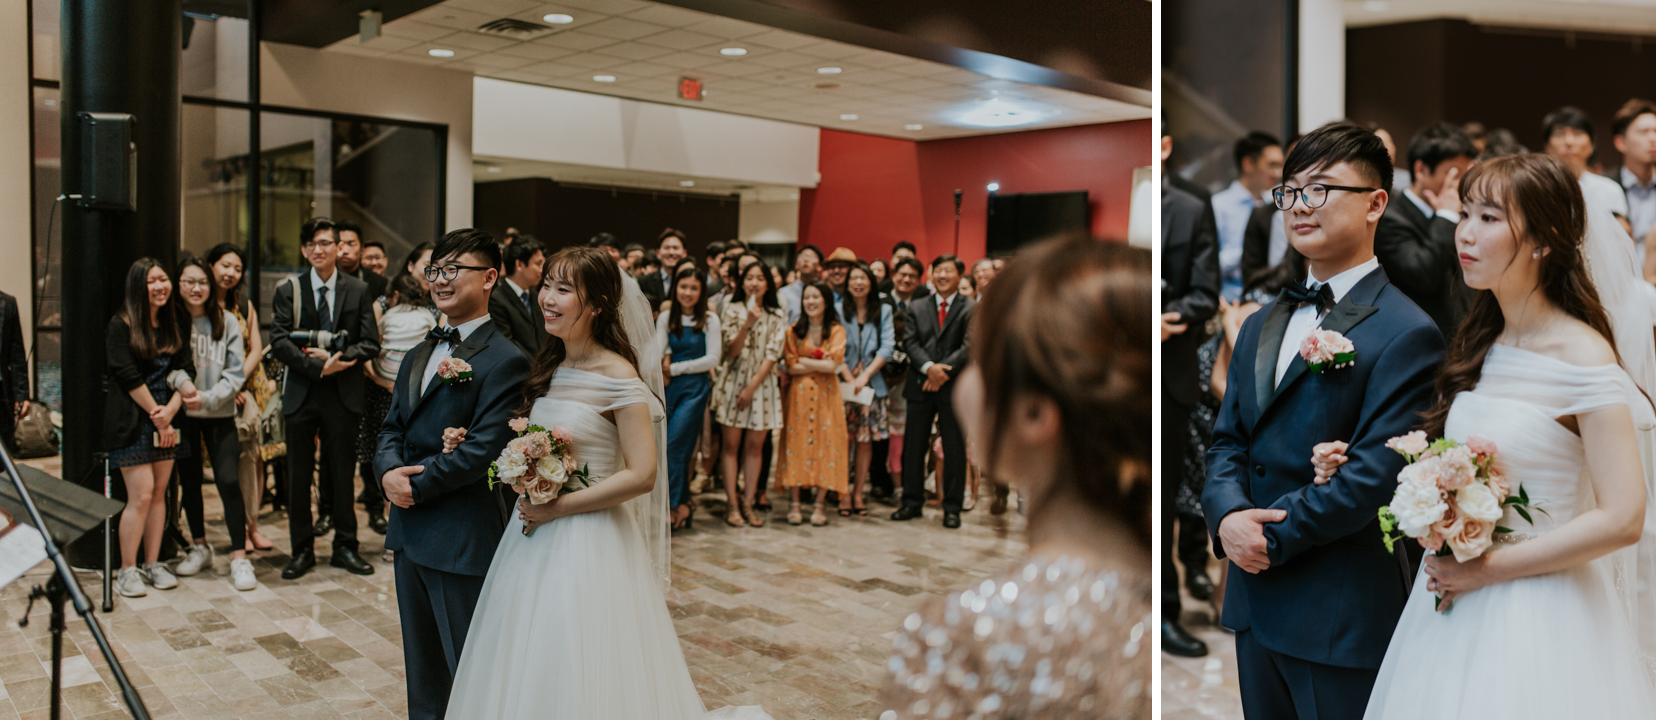 LGP-ann-arbor-eagle-crest-wedding-029.jpg